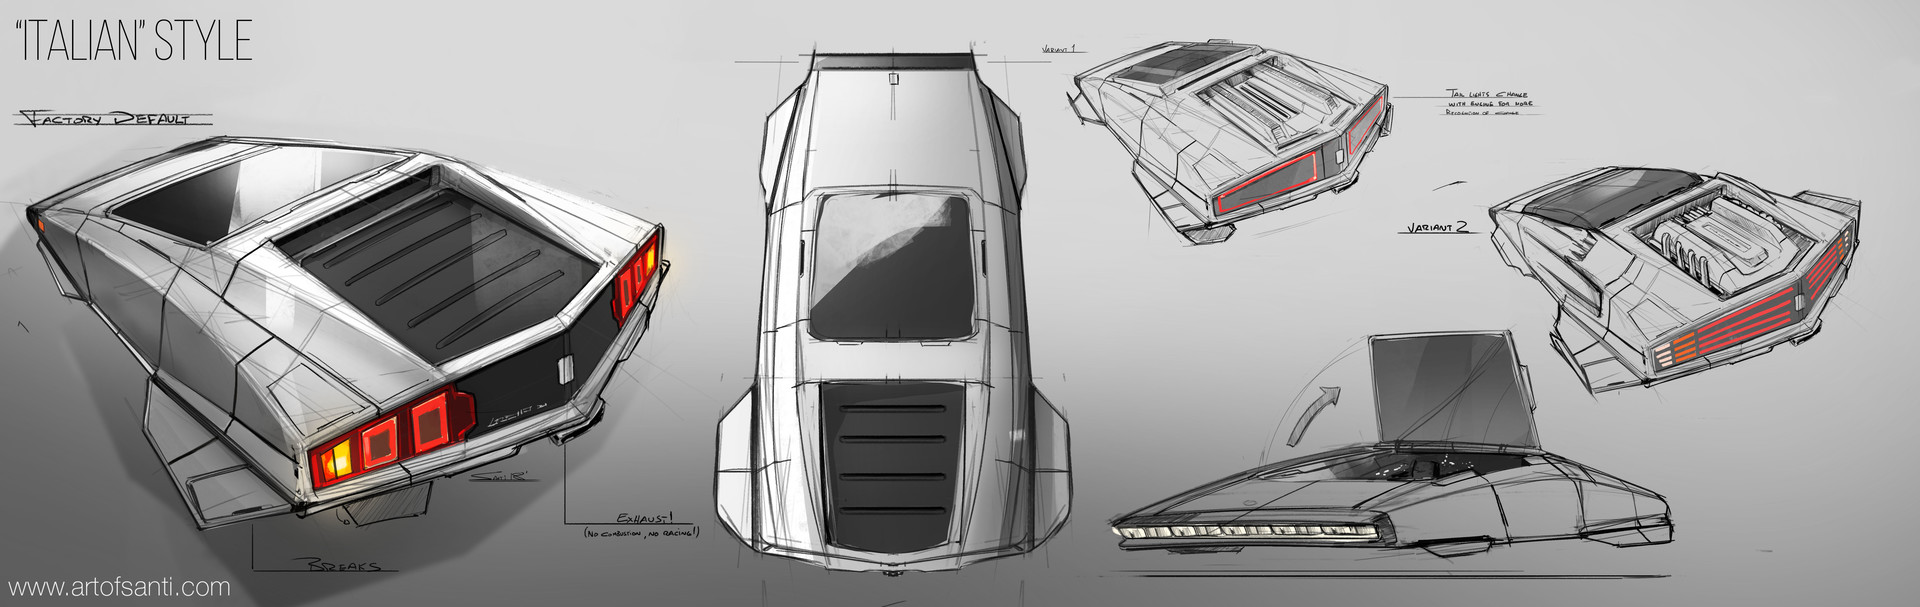 Santiago fuentes spaceracer vehicles concept v001b santiagofuentesitalian style